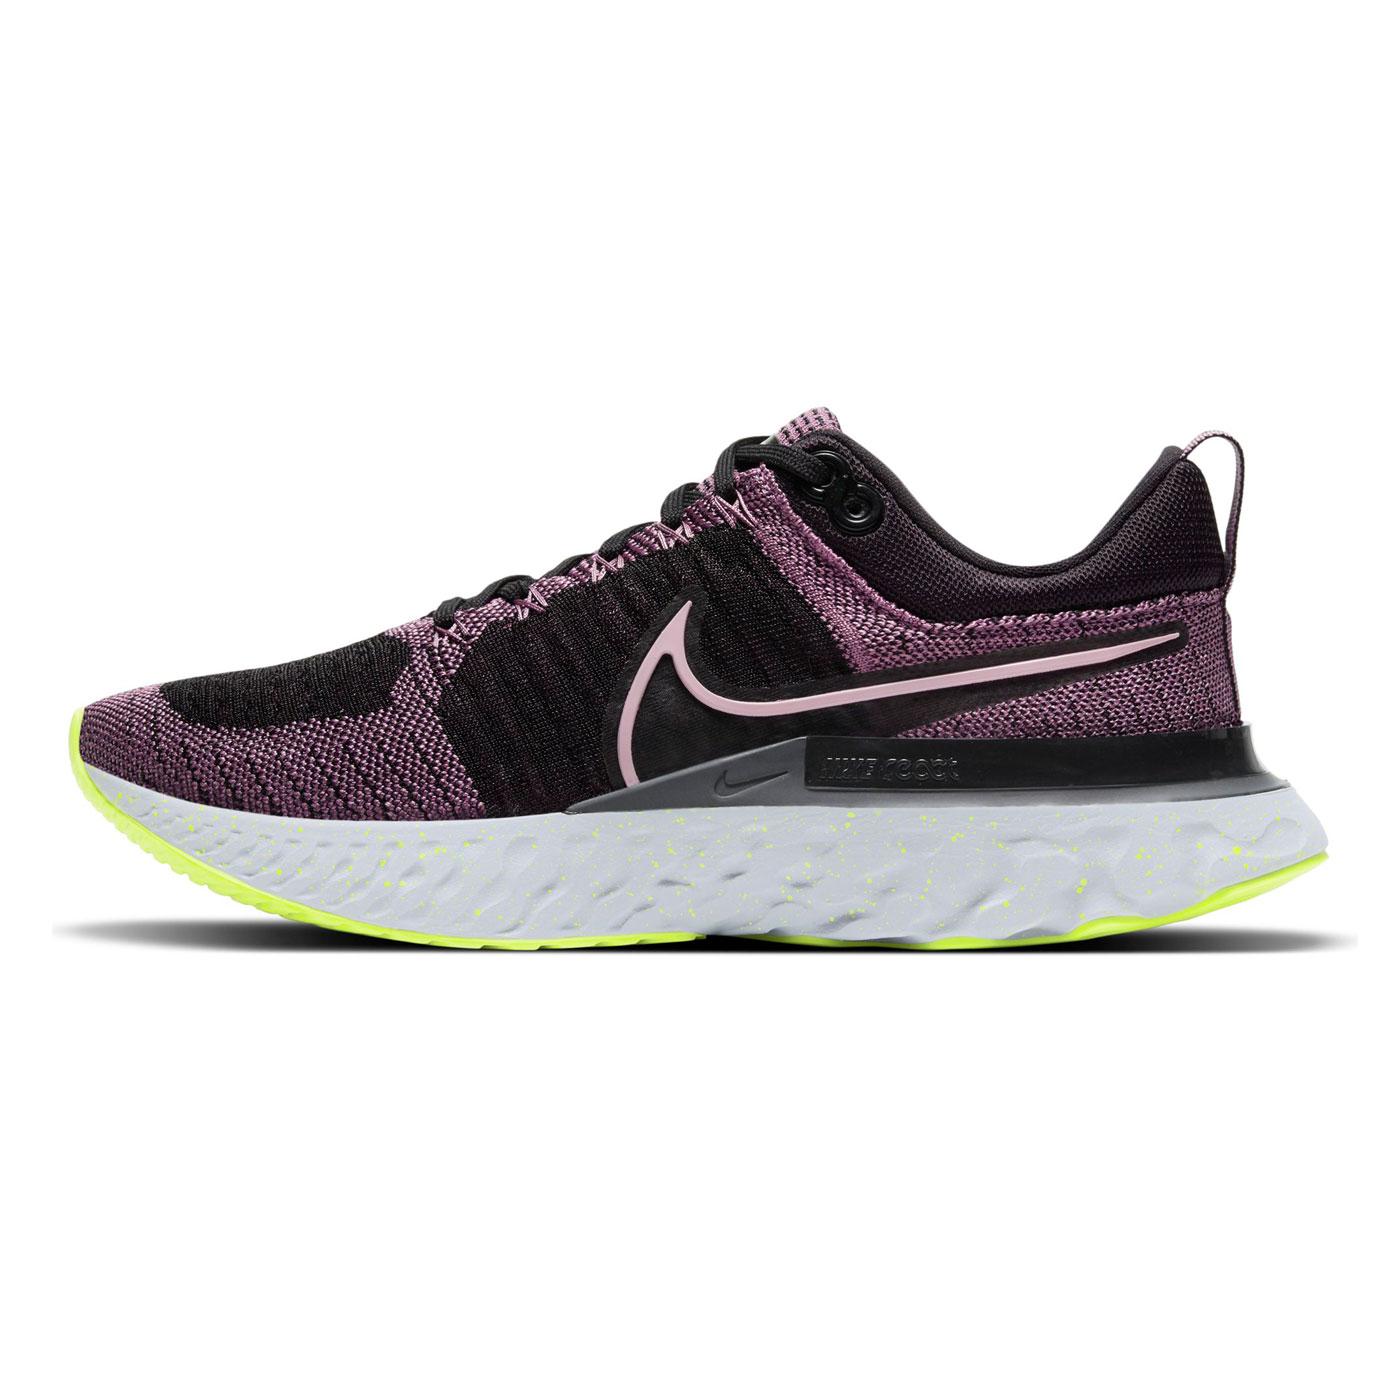 Nike React Infinity Run Flyknit 2 for women